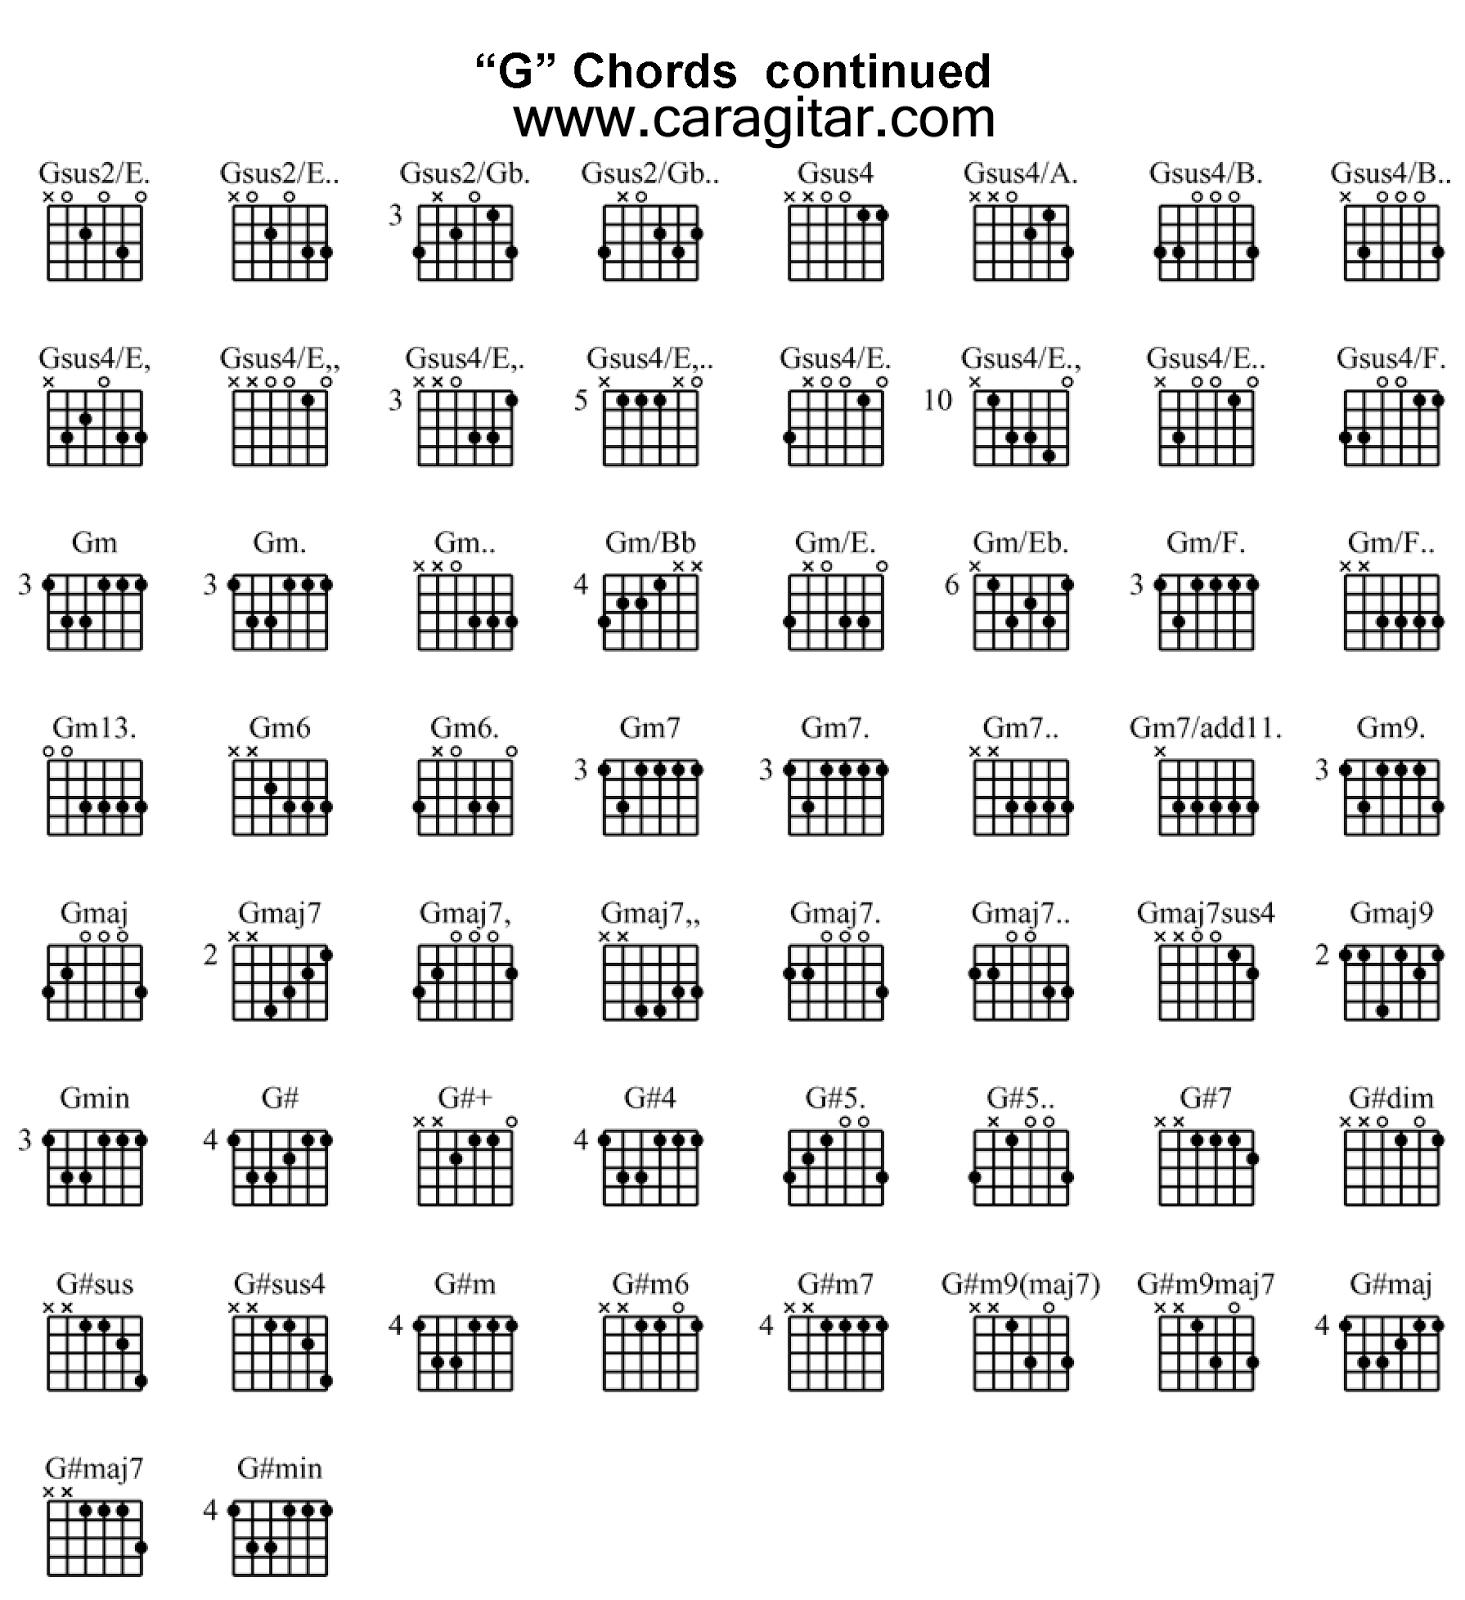 Gambar Understanding Kunci Gitar Minor Gambar Ritem di